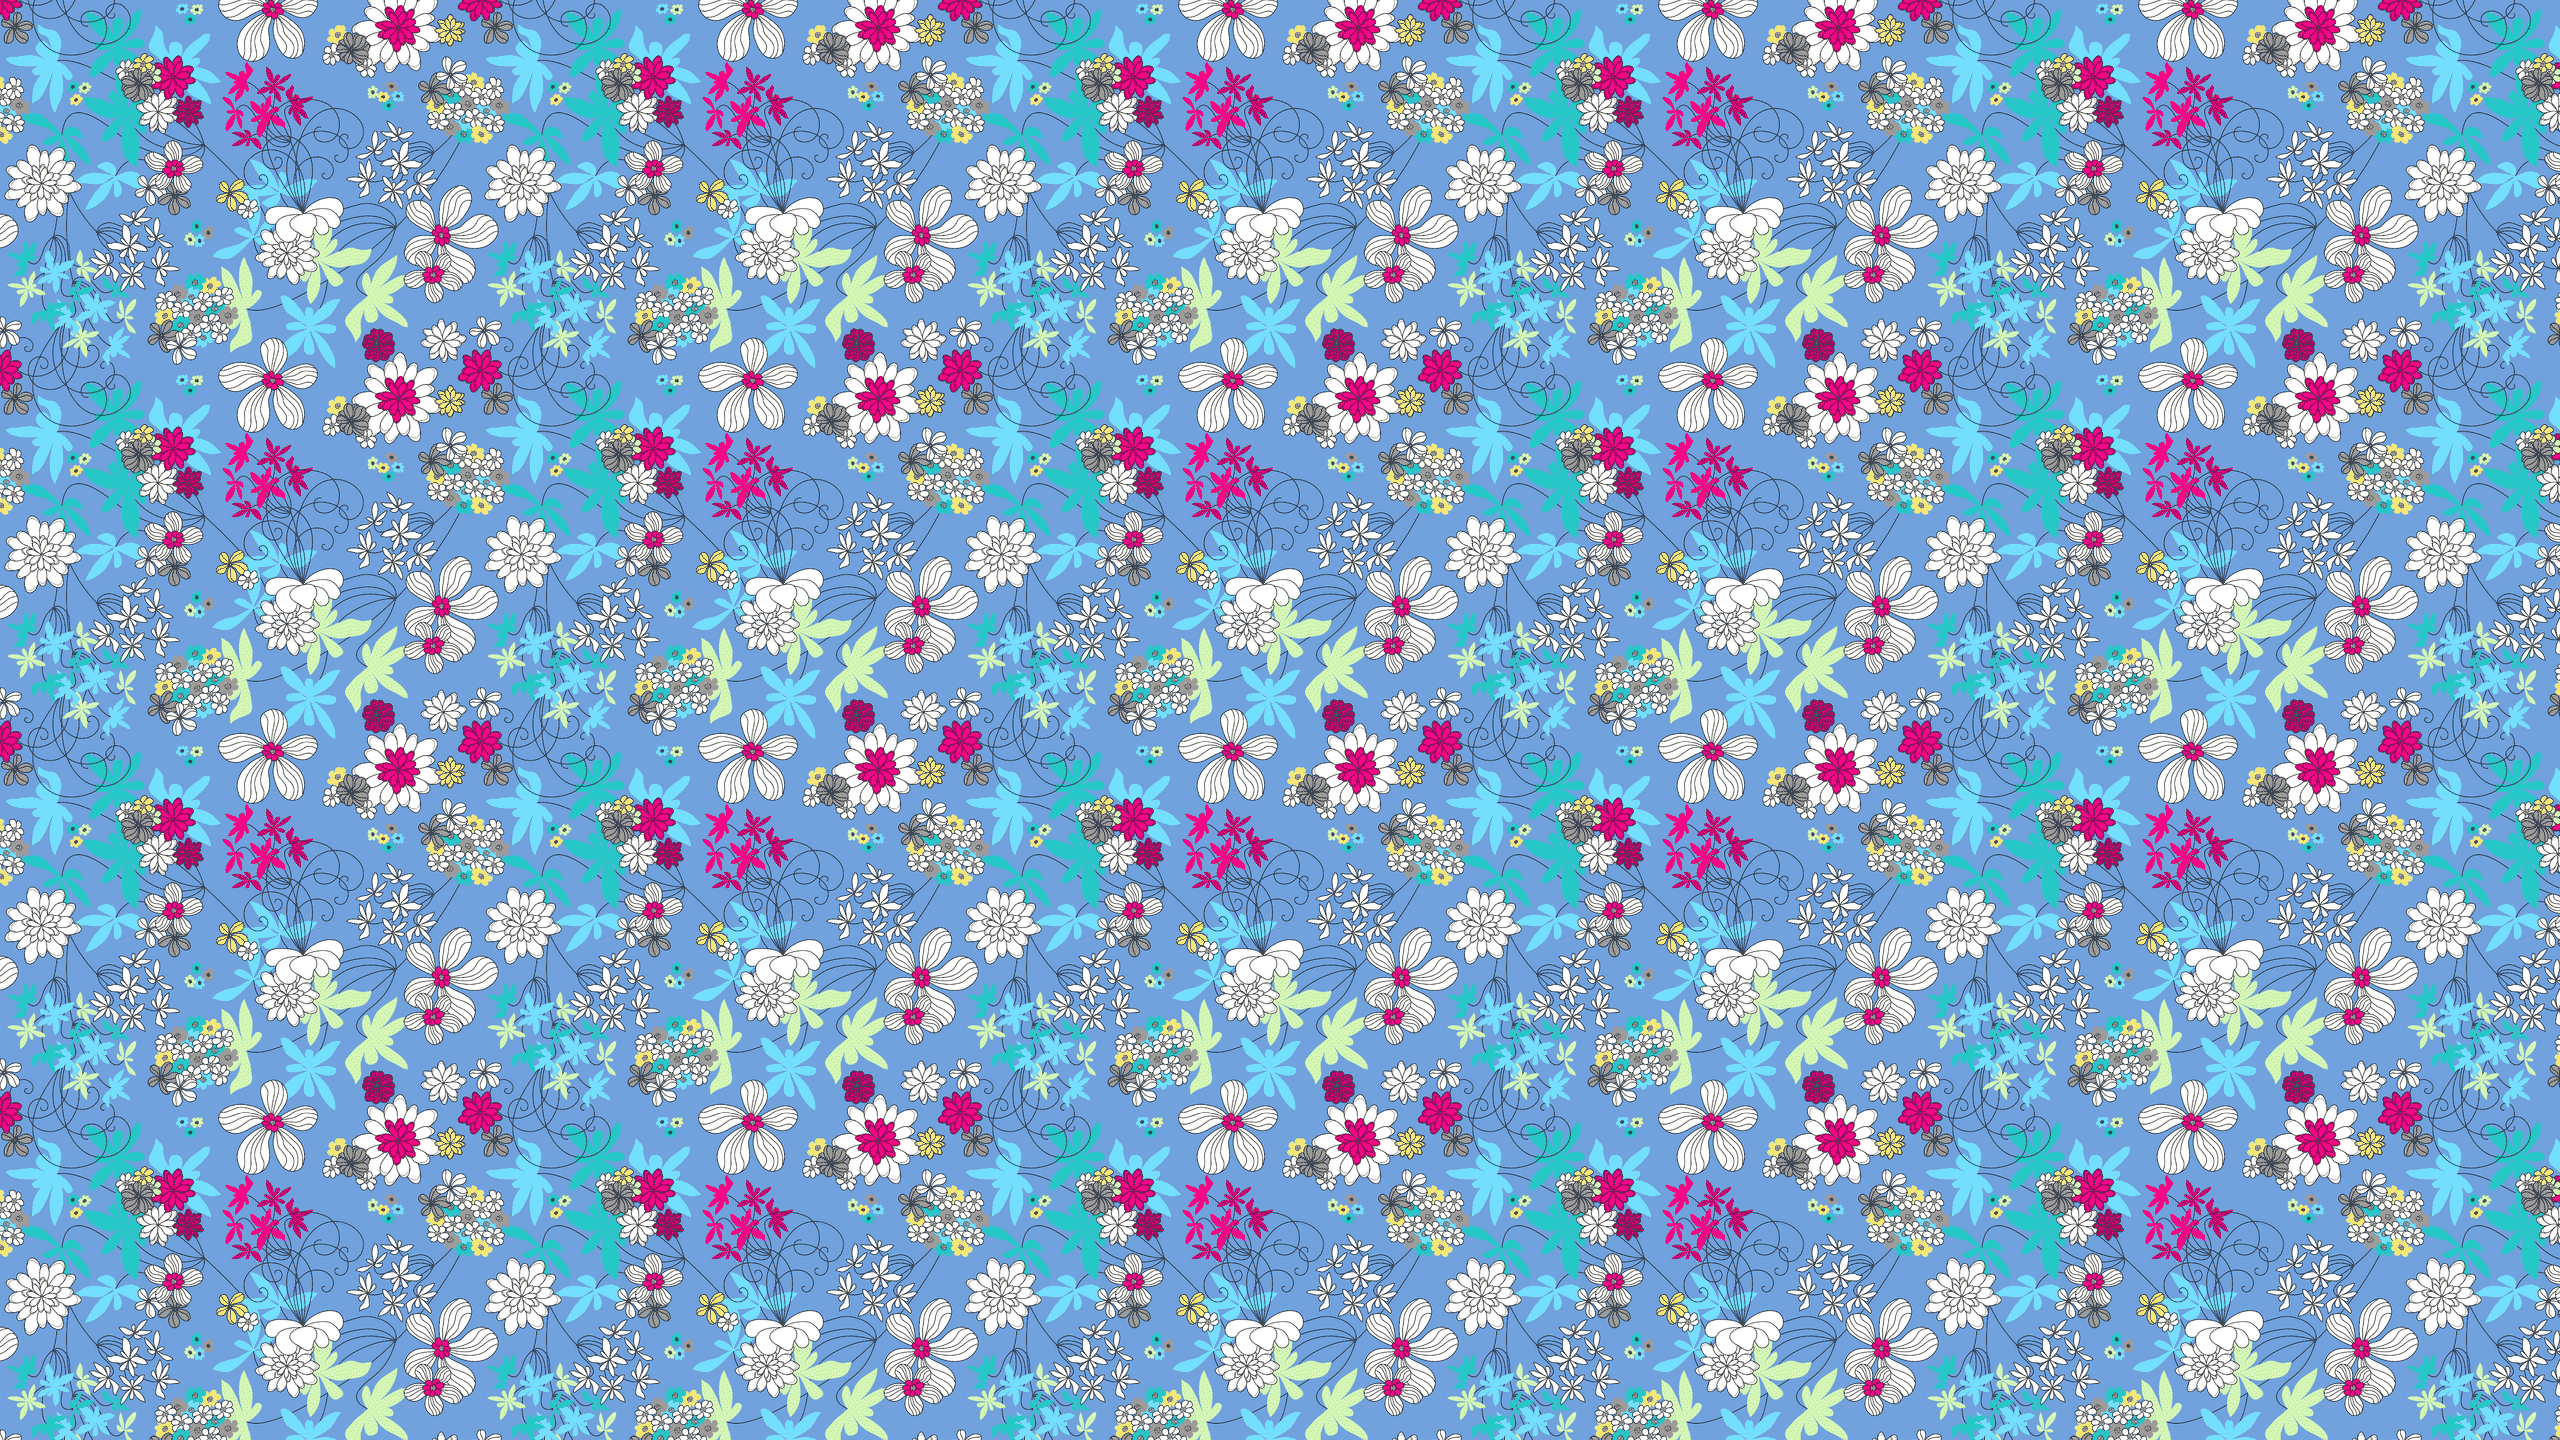 Flowers desktop cute wallpaper wallpapers   1337037 2560x1440